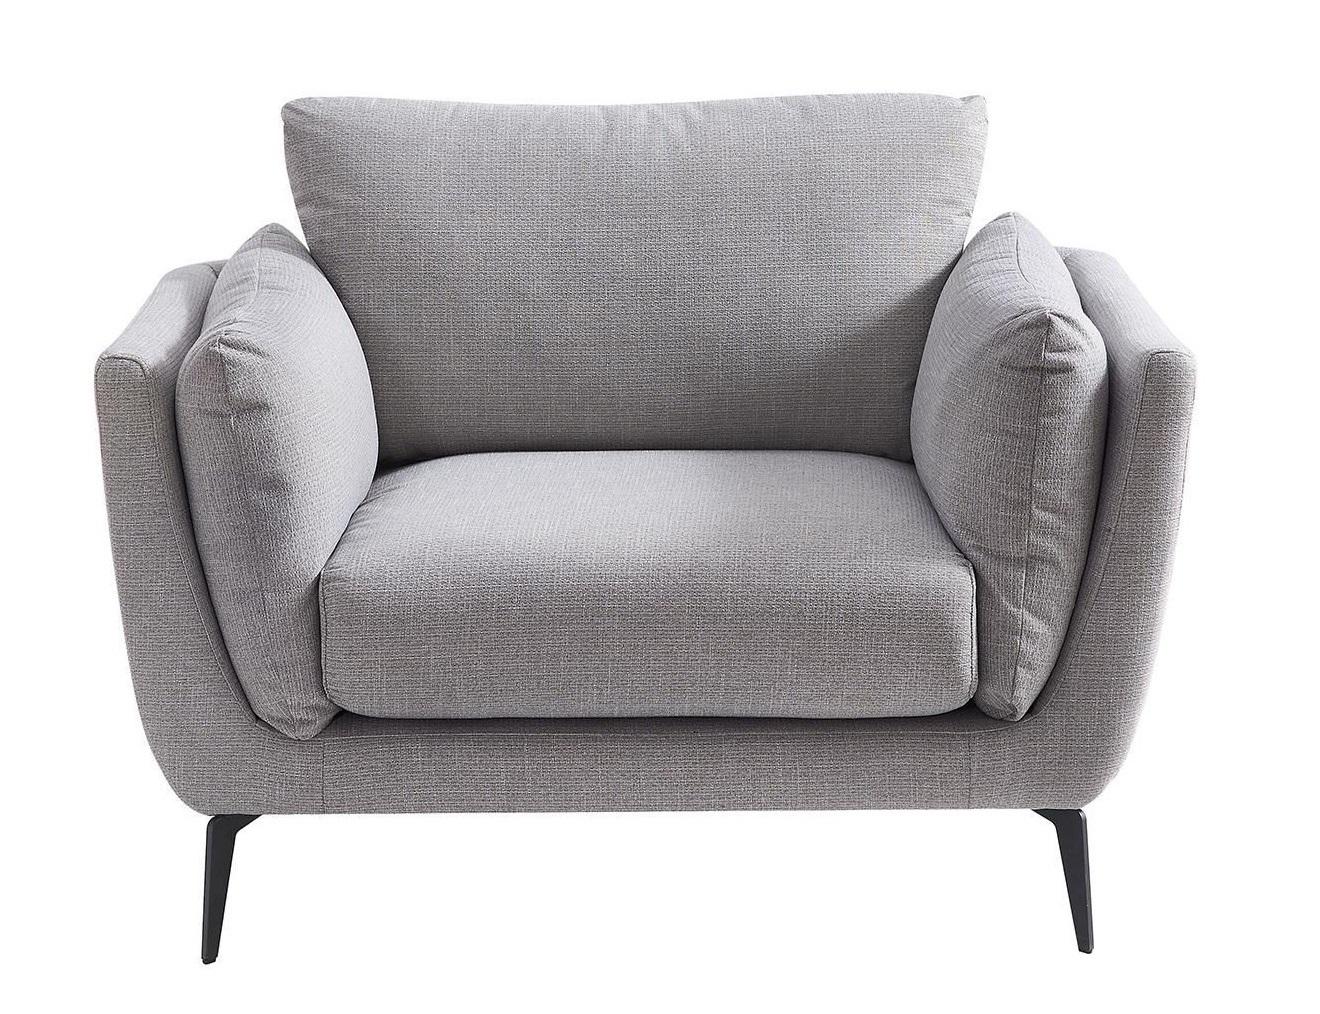 Кресло Amsterdam 5176 Серый Никель (NICKEL)